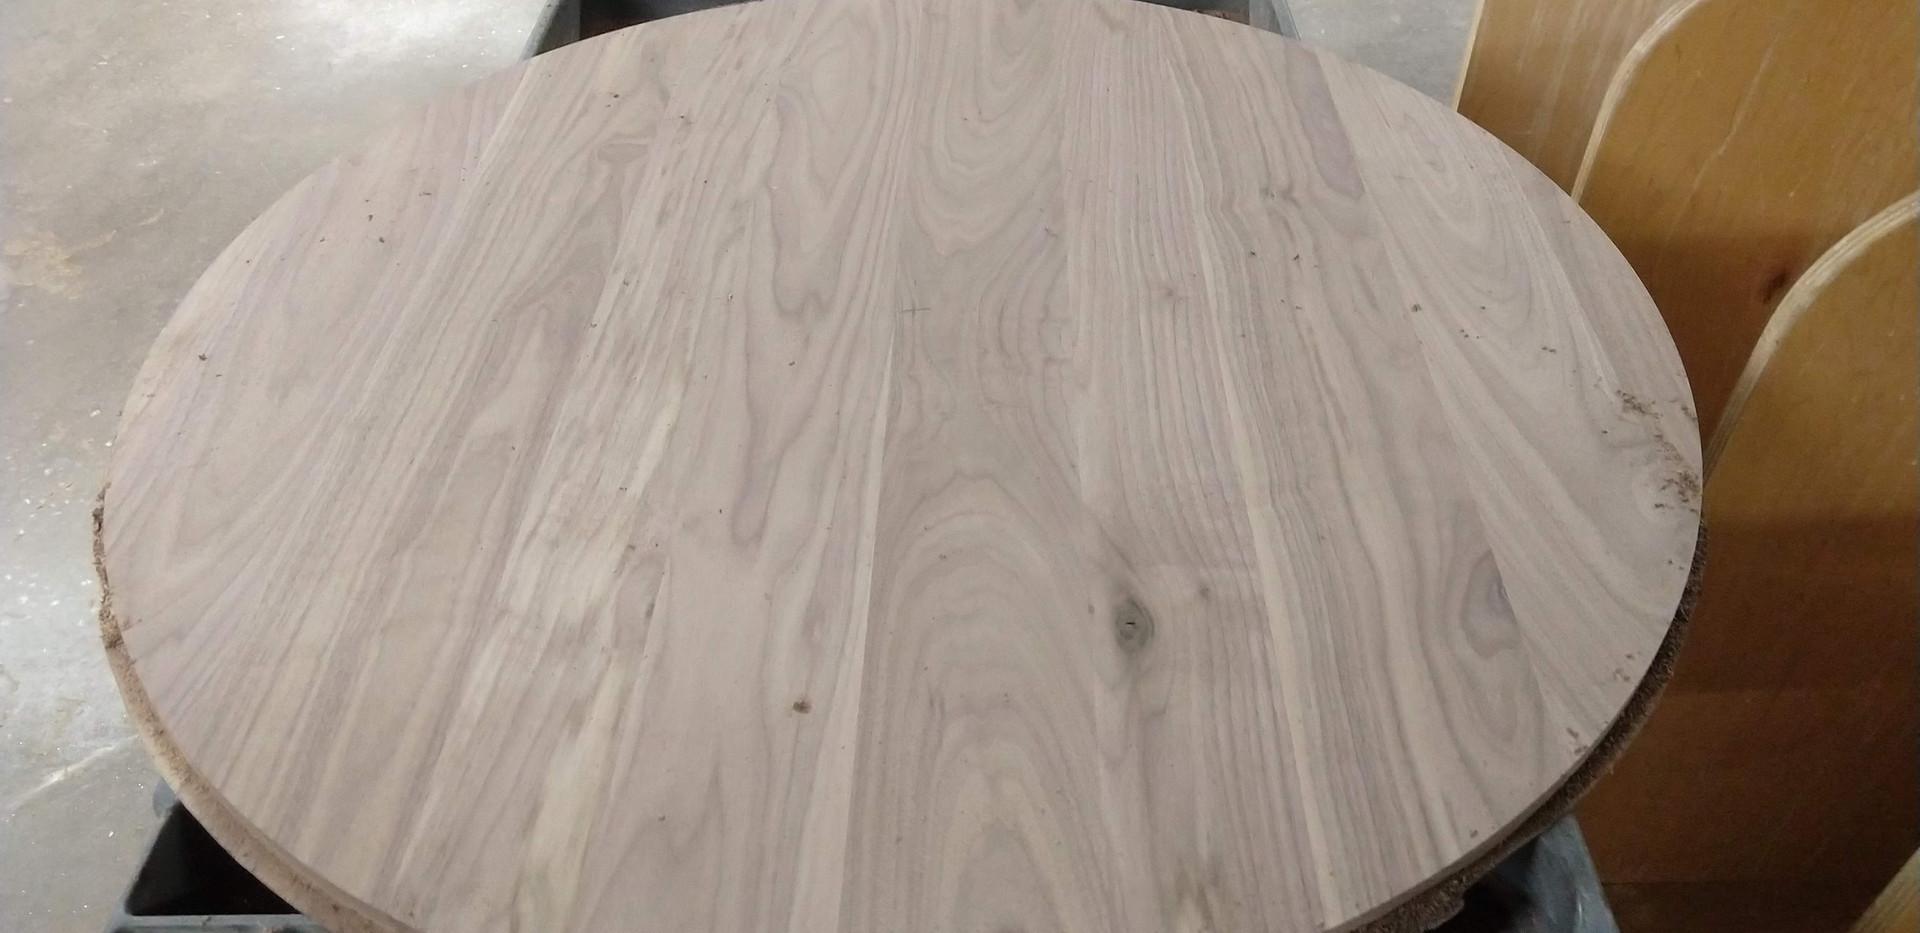 walnut tabletop fresh off the cnc